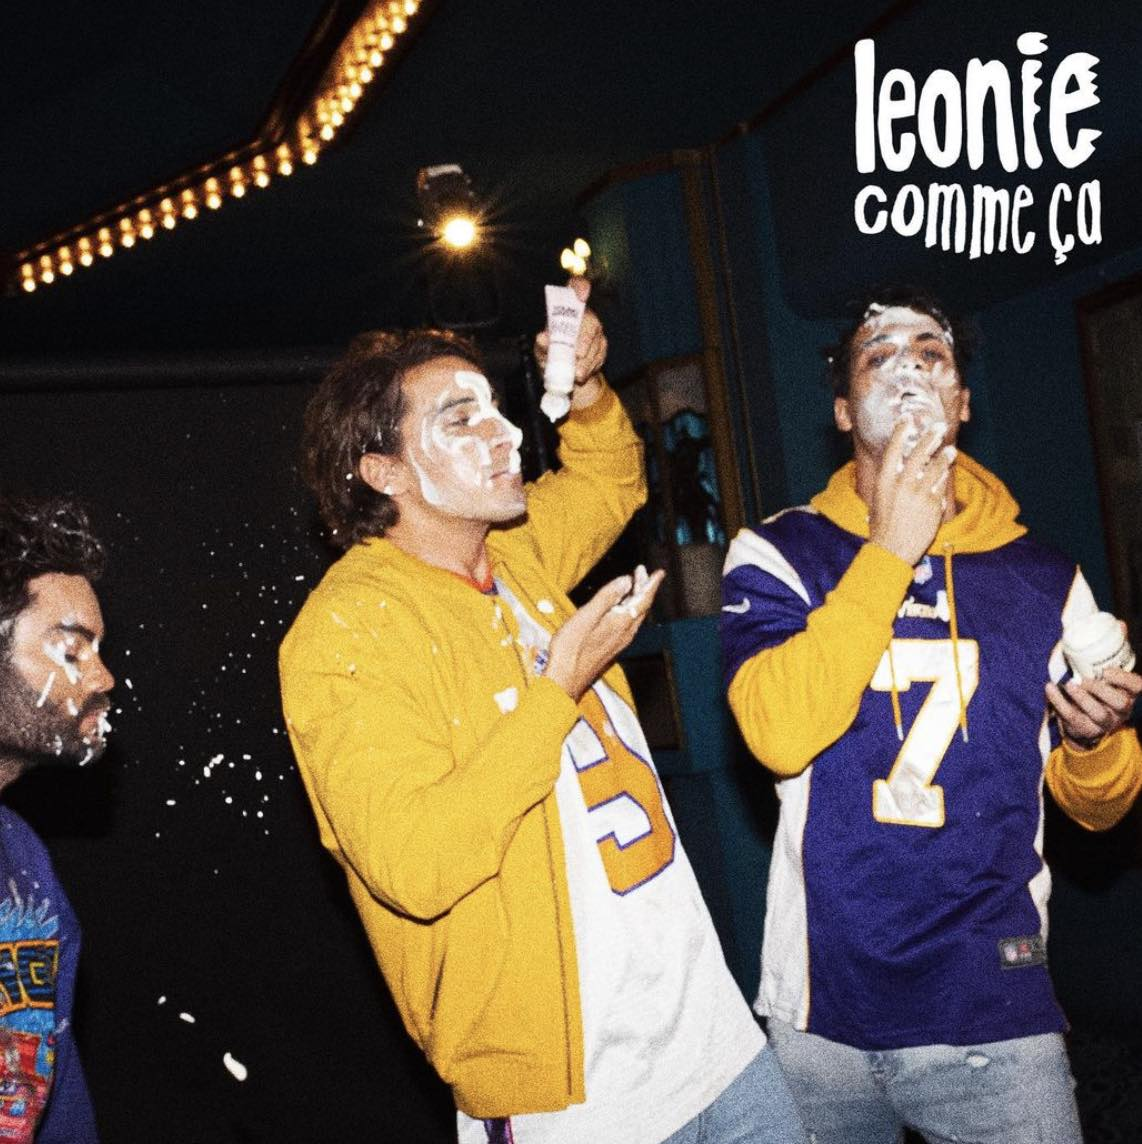 Leonie - Comme ça